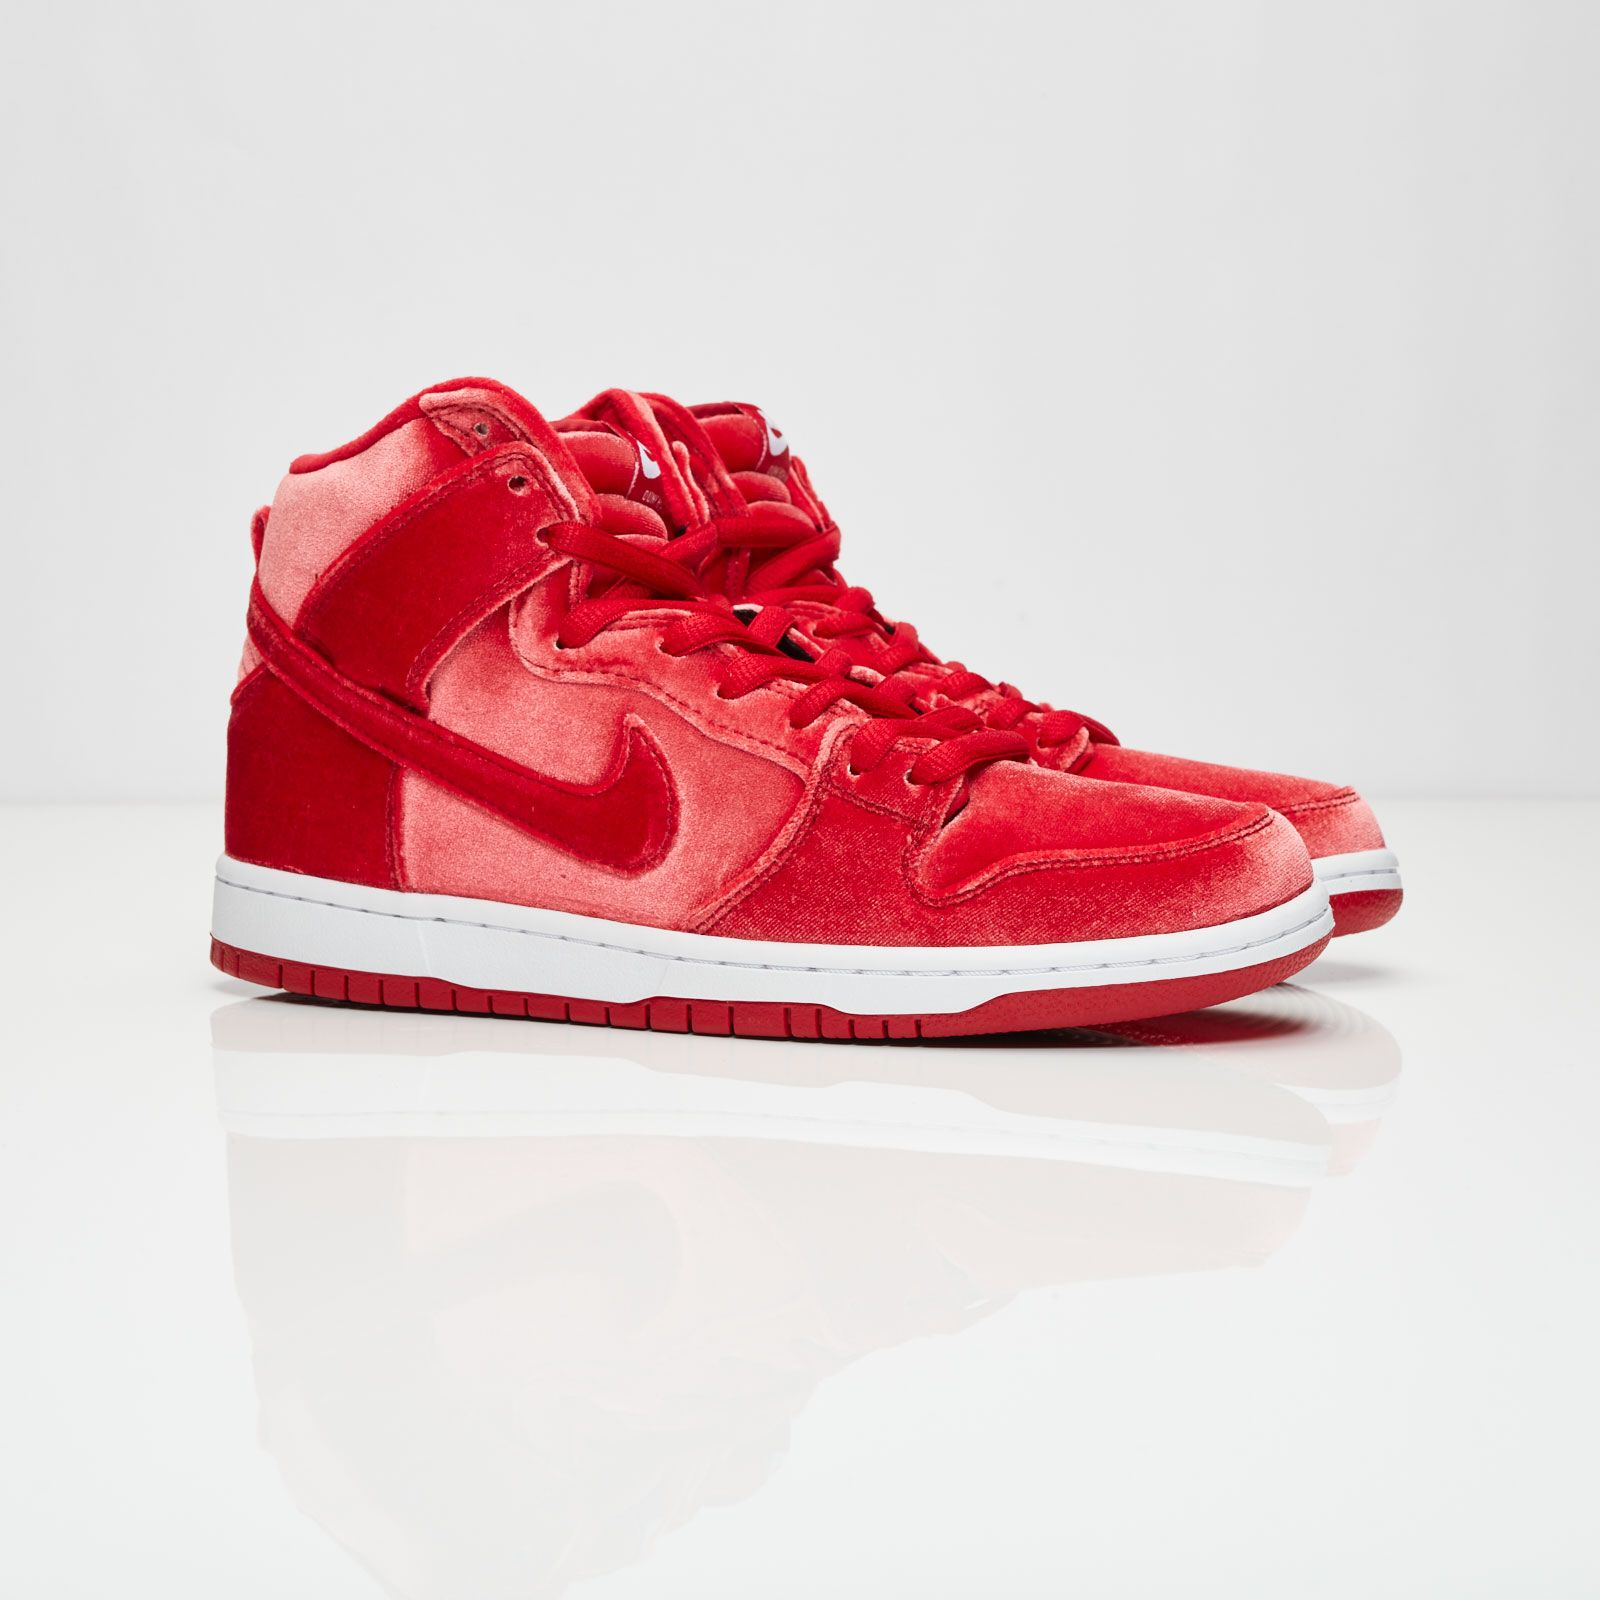 quality design e332e 884f1 nike dunk high sb red velvet | Clothing/Footwear | Nike ...